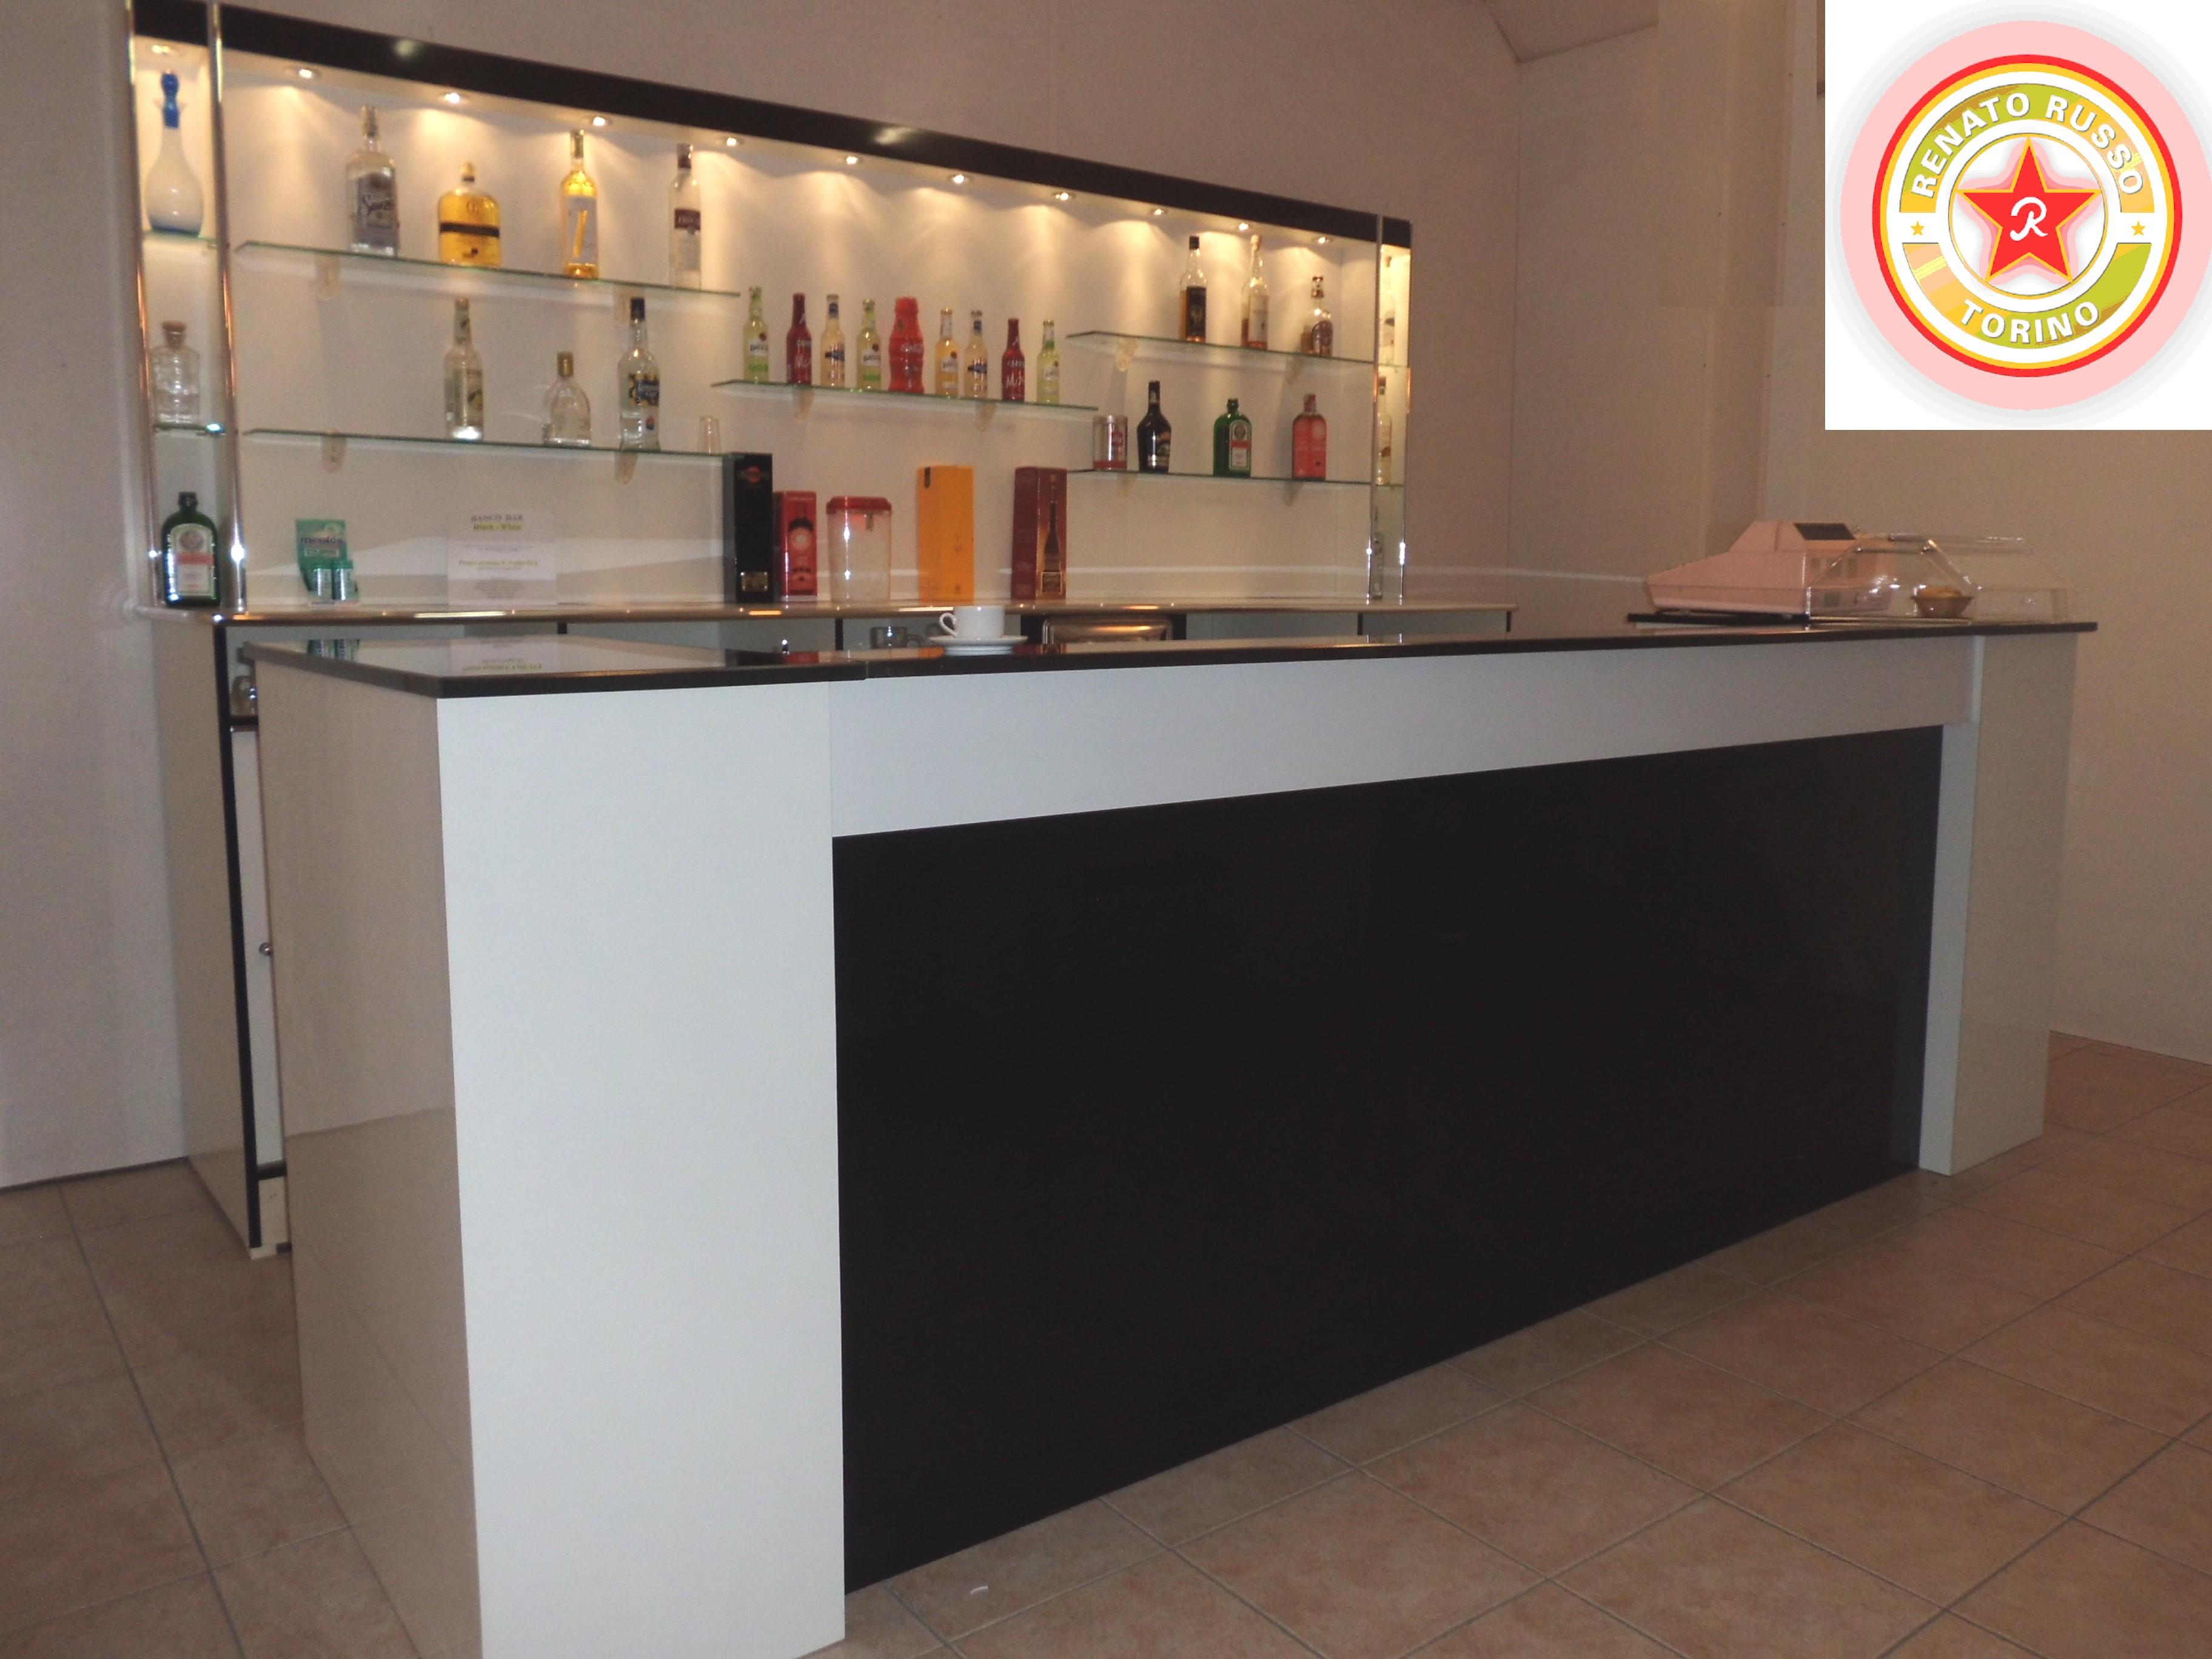 Banchi Bar In Promozione Prezzi Banchi Frigo Banconi Bar